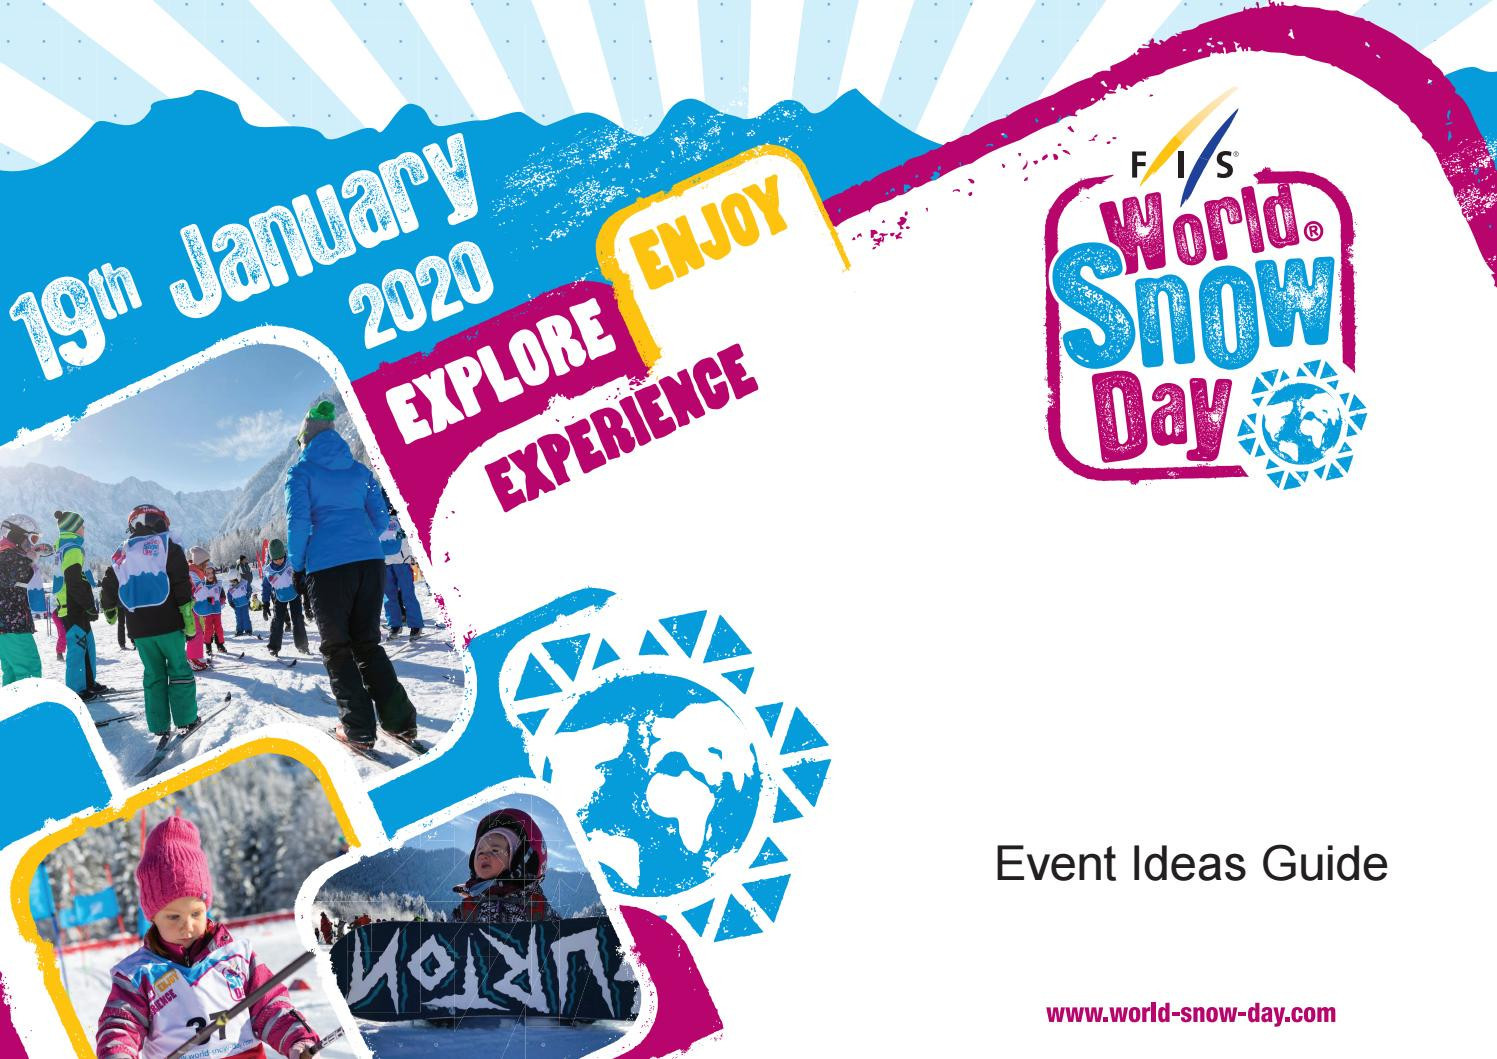 FIS President Kasper hails World Snow Day activities